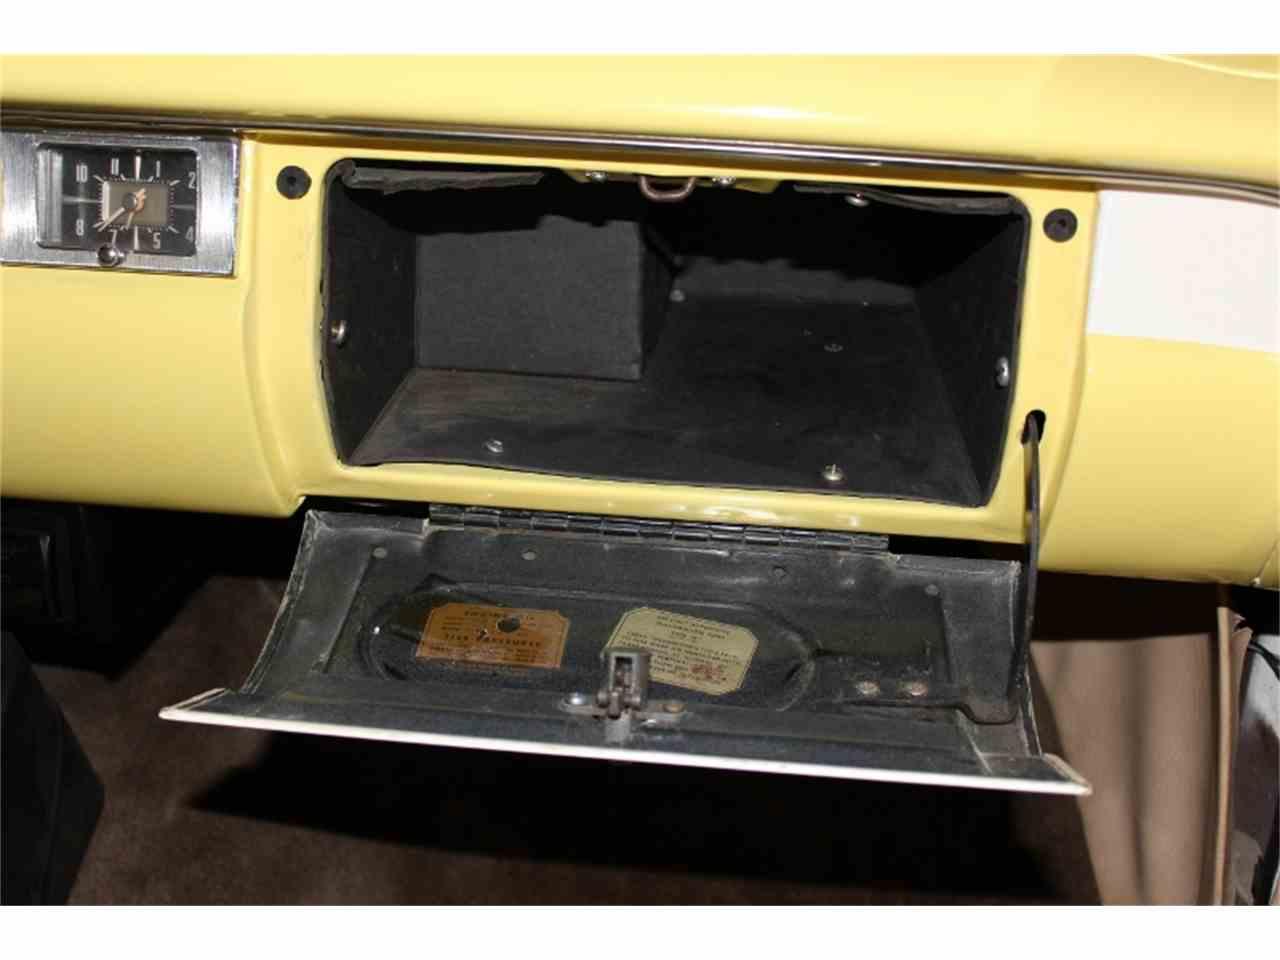 Large Picture of Classic '57 Ford Fairlane 500 located in North Carolina - $48,500.00 - LRPU